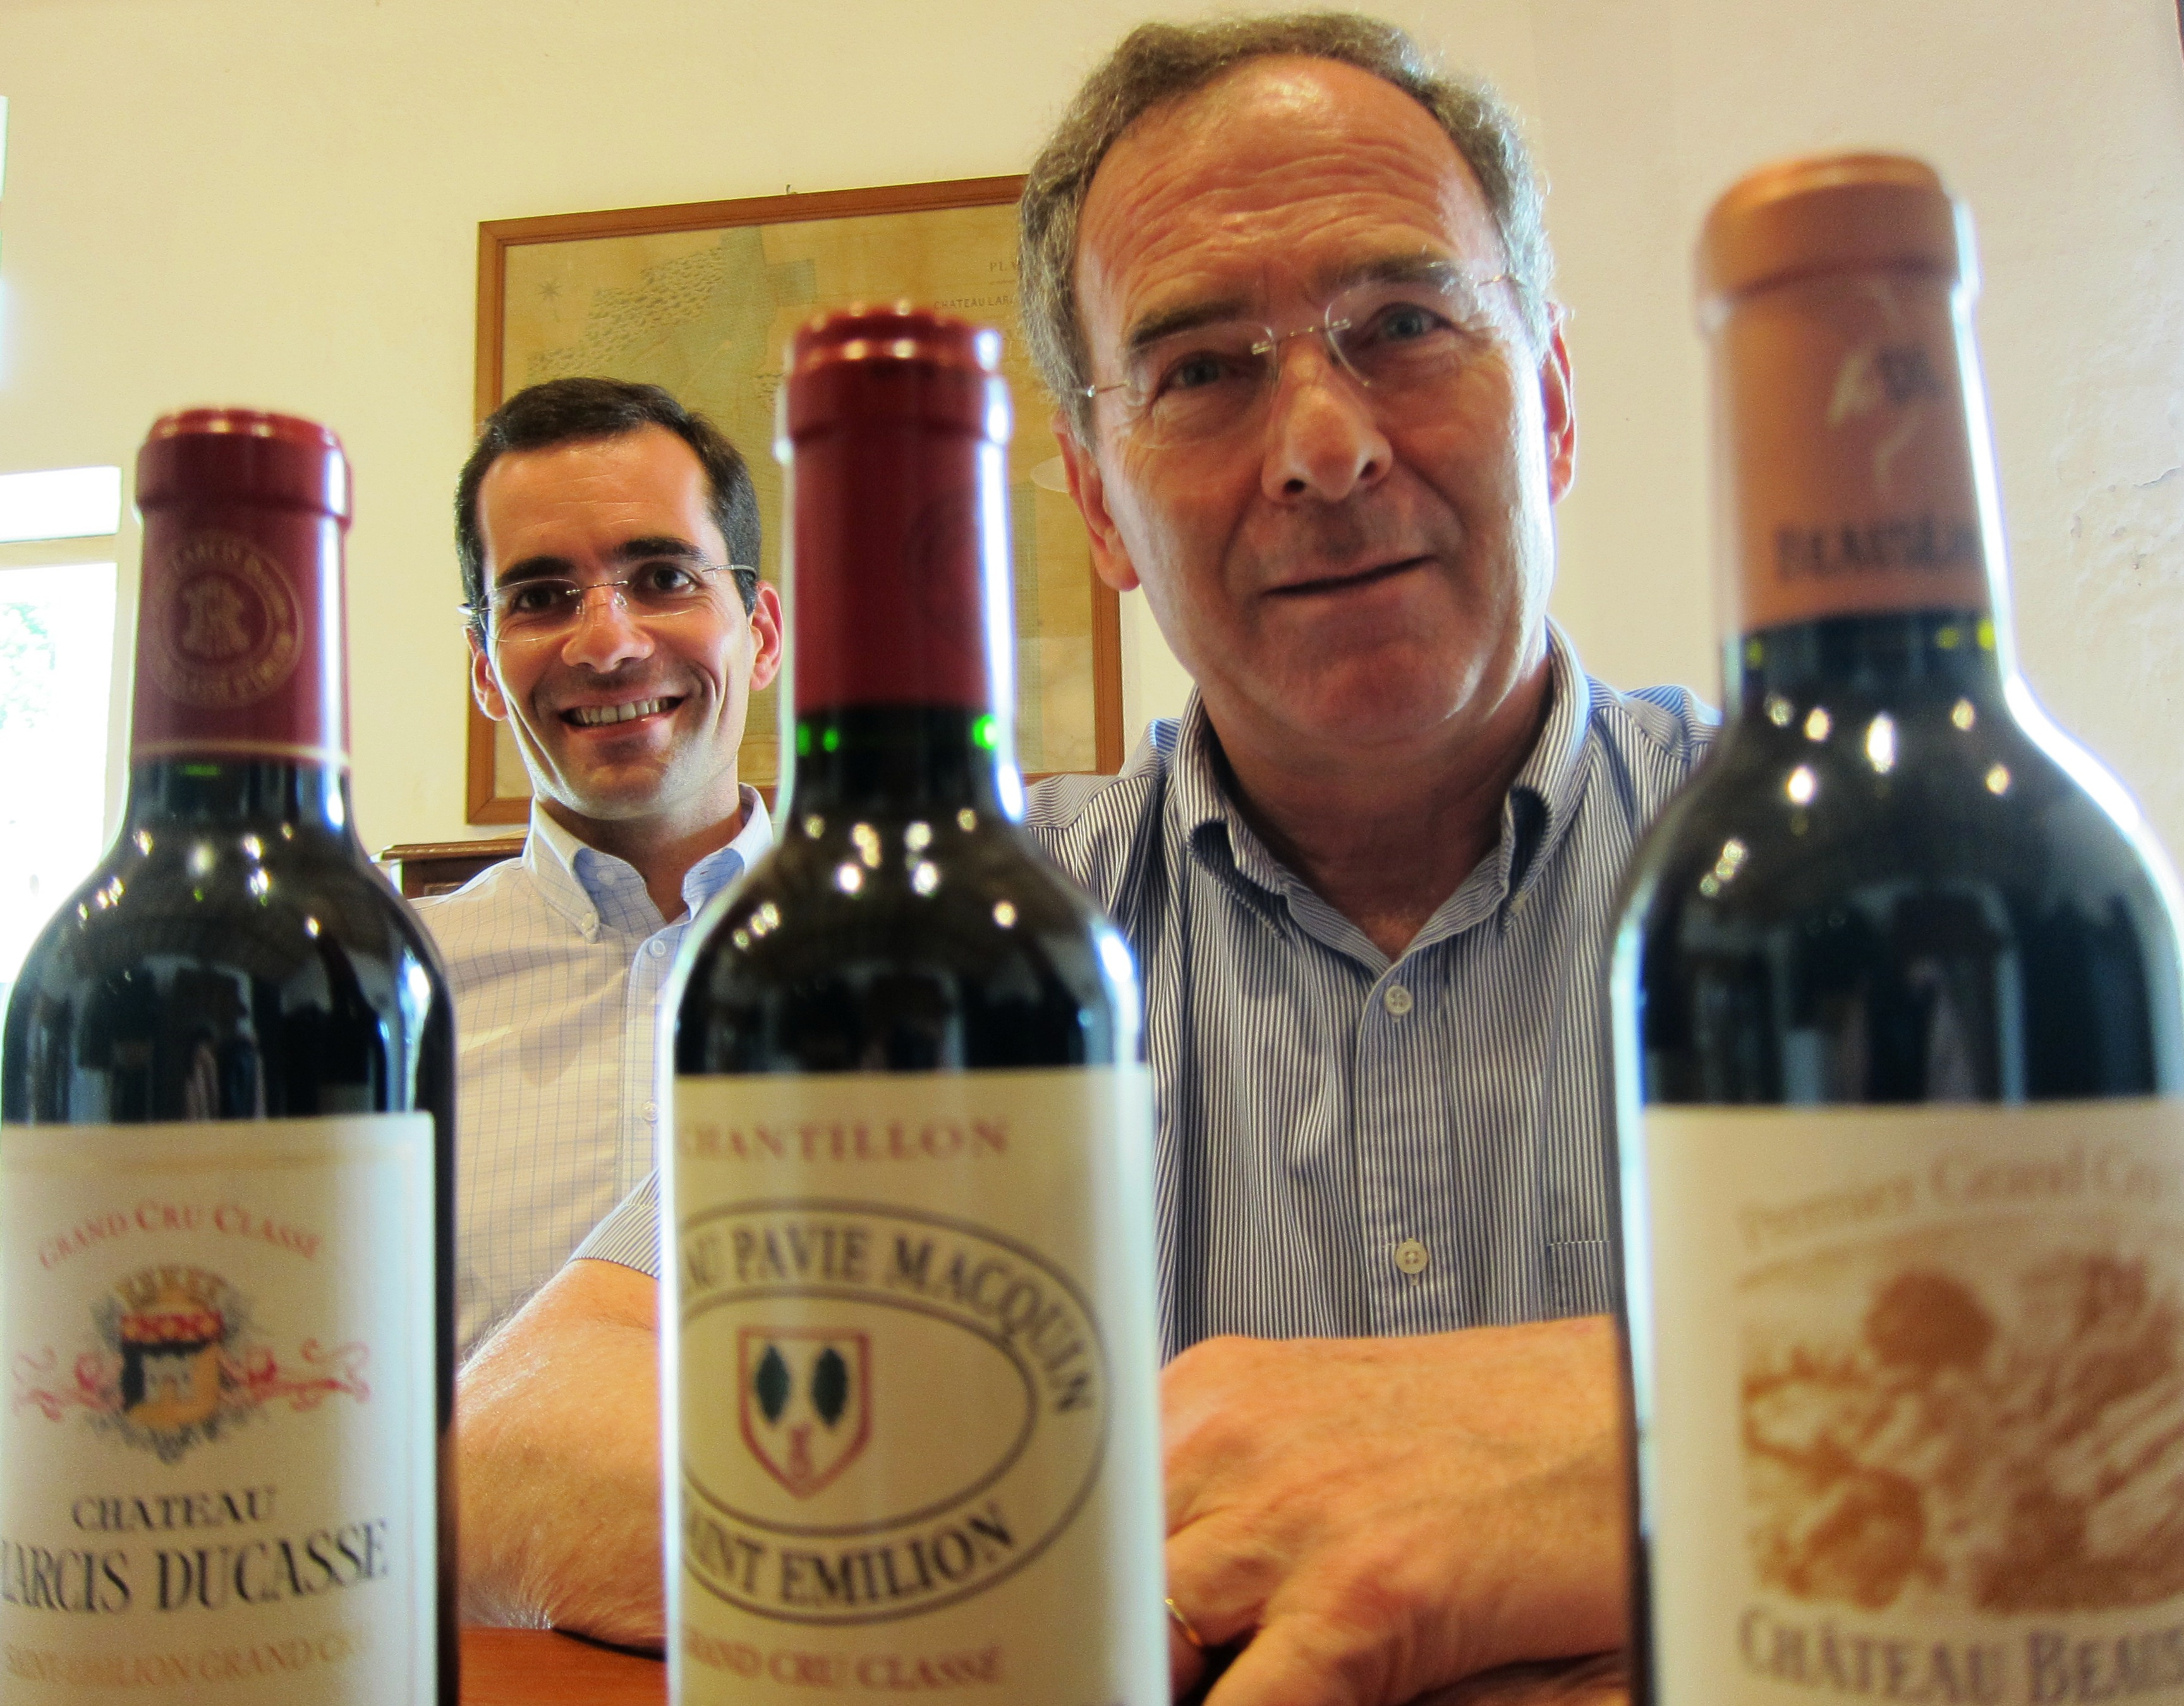 Nicolas Thienpont St. Emilion 2010 Bordeauxc wine